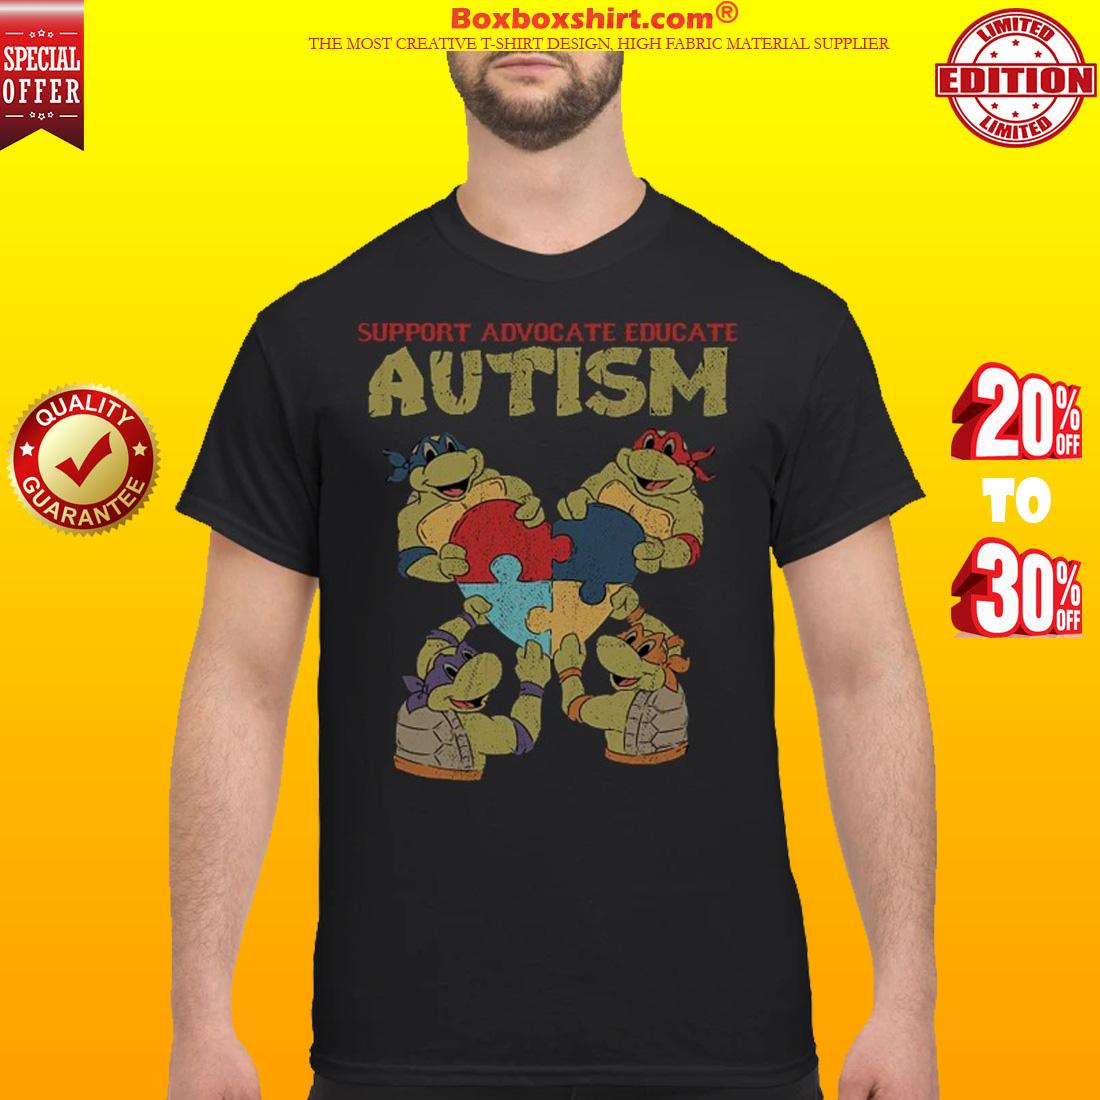 e2996526db91 10% OFF] Ninja turtle support advocate educate autism shirt